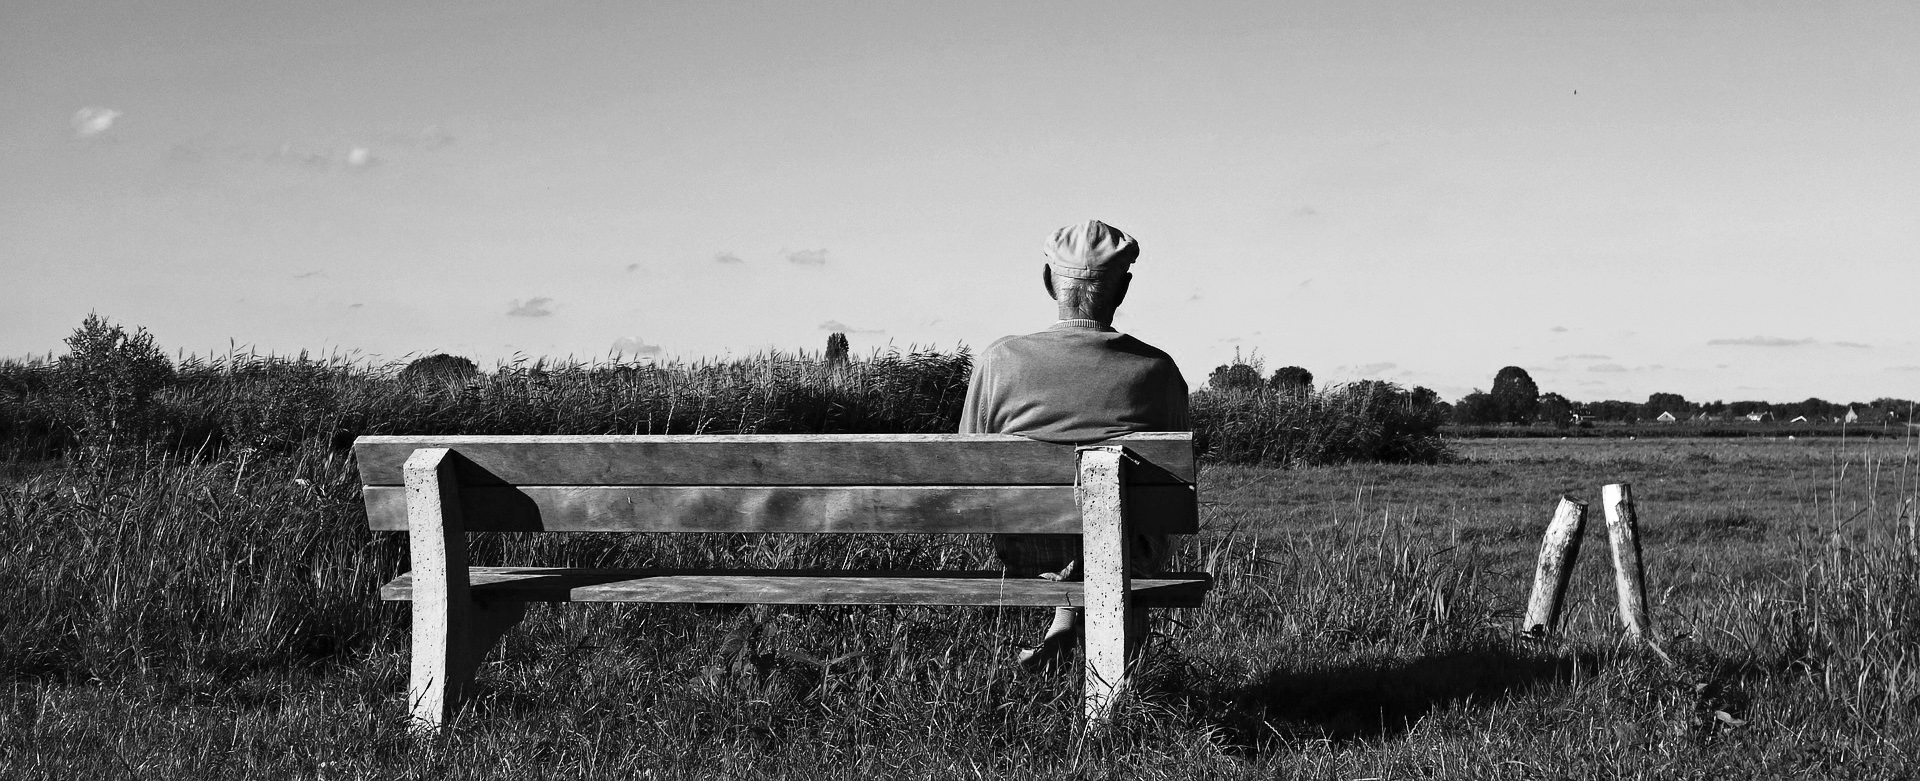 Burnout Altersgruppen Senioren Rentner